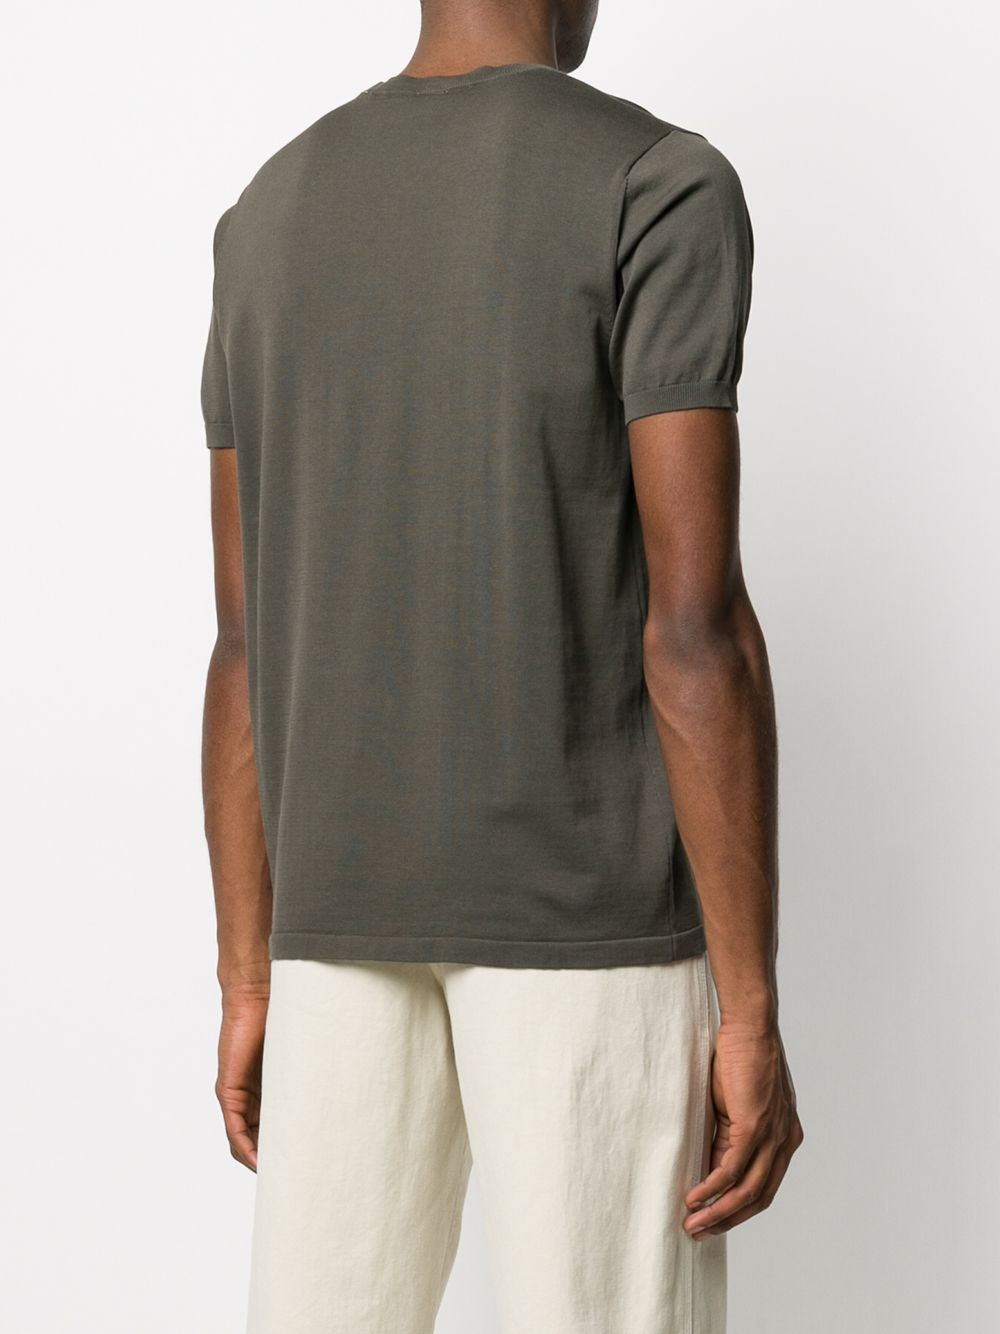 Aspesi t-shirt con maniche aderenti uomo ASPESI | T-shirt | M149 337101241